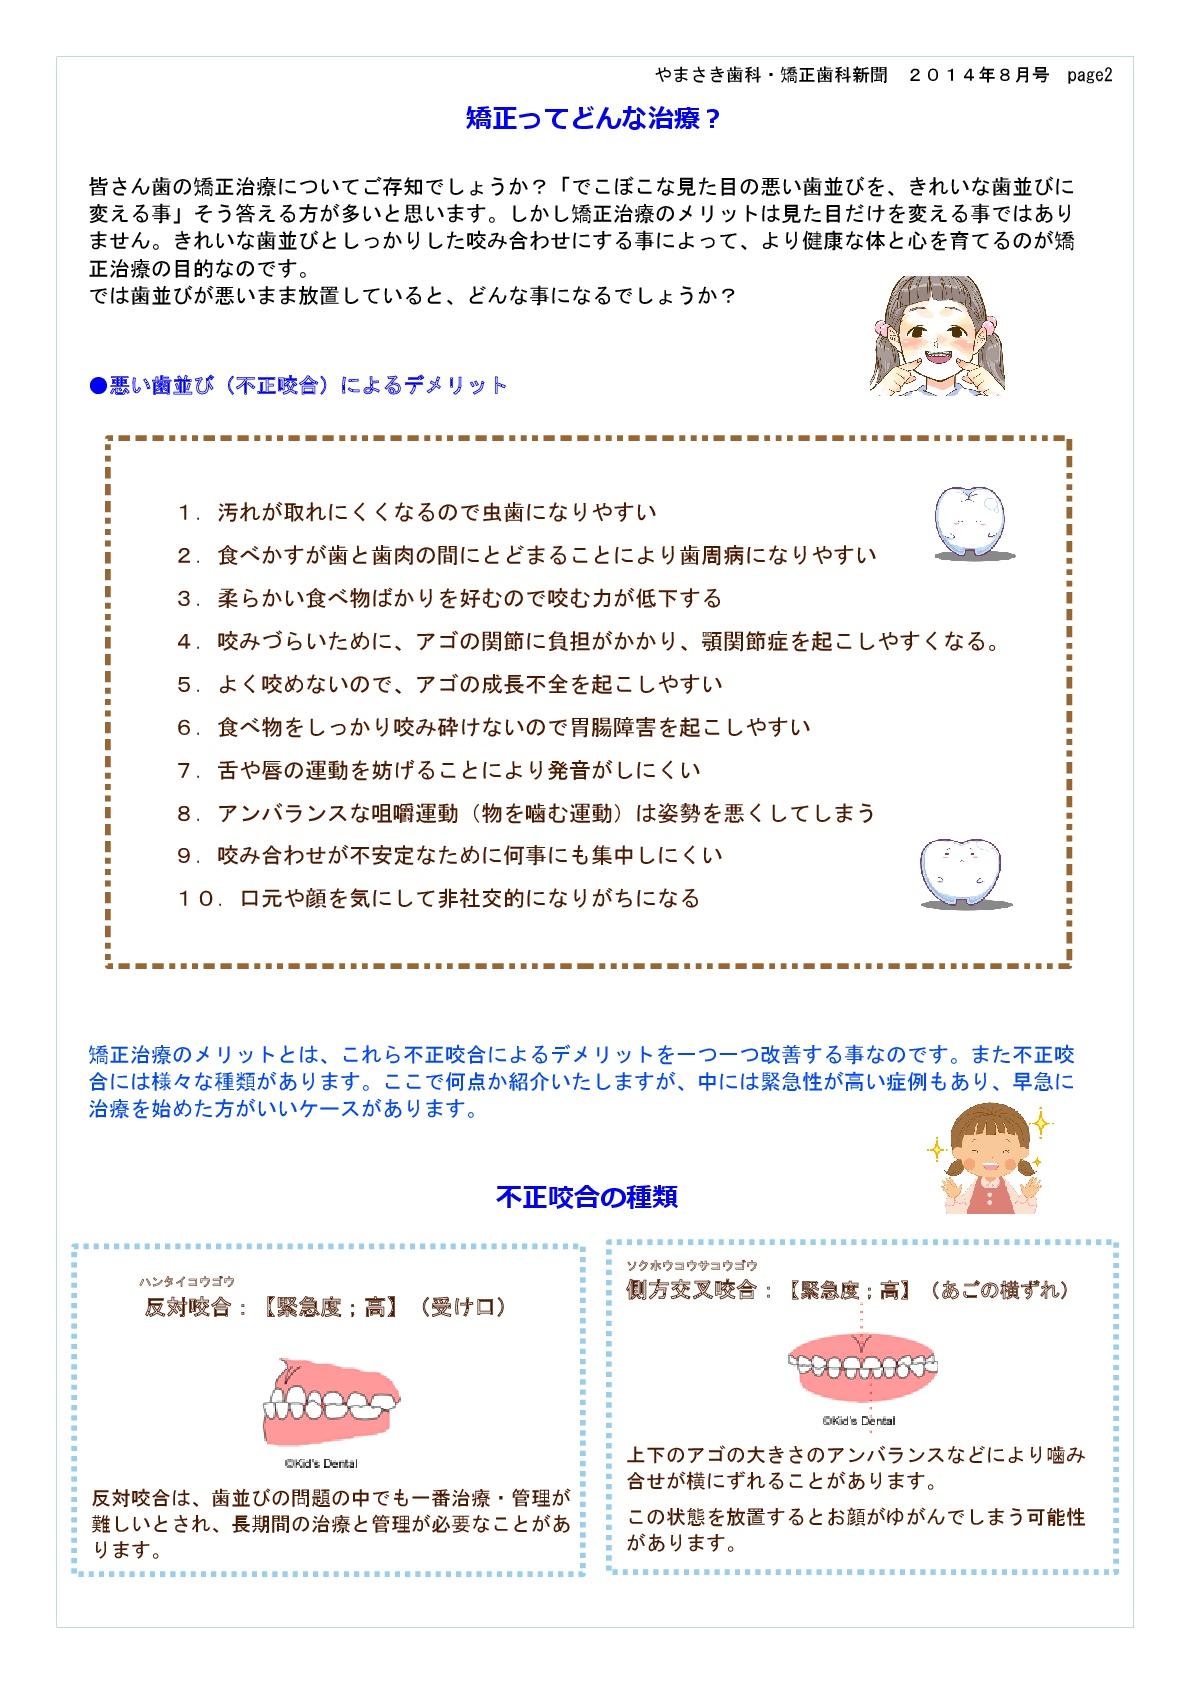 sinbun14-8-2-001